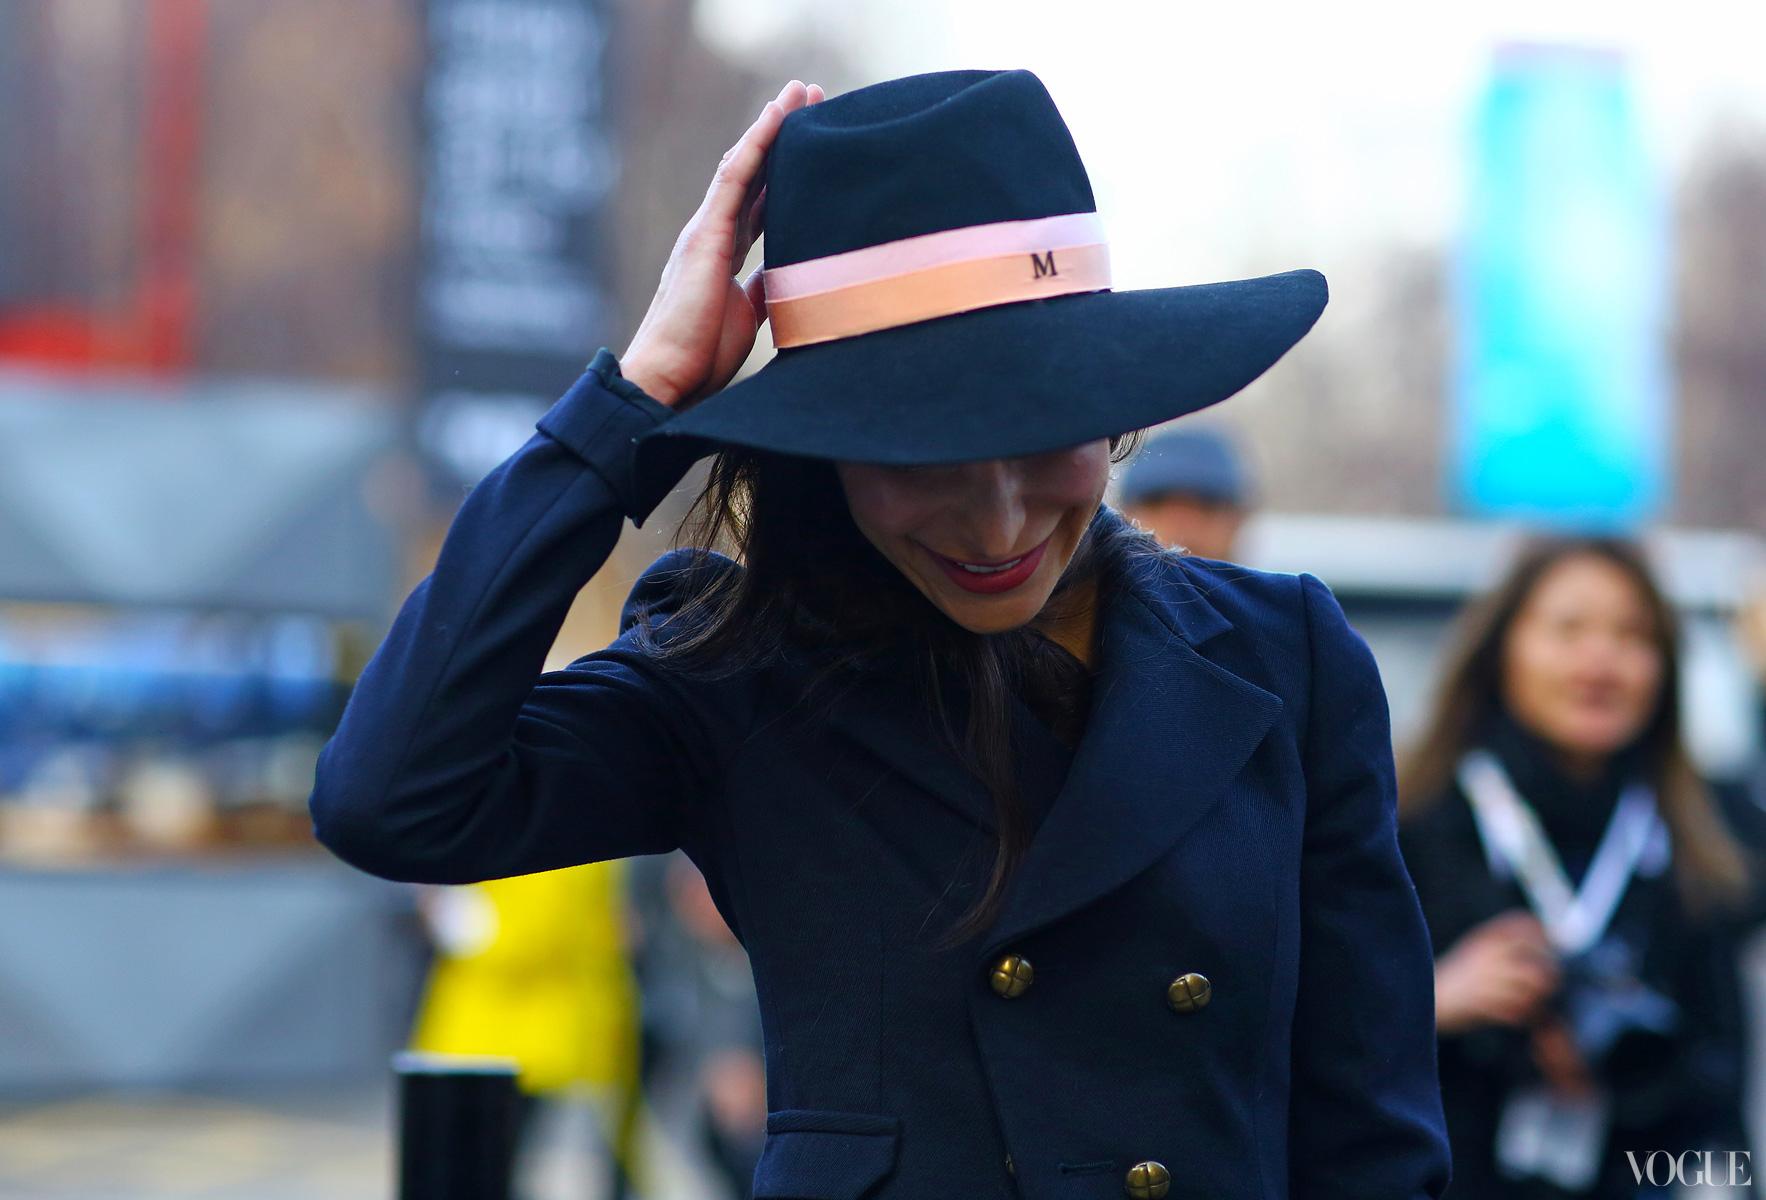 onde-comprar-chapéu-em-bh2